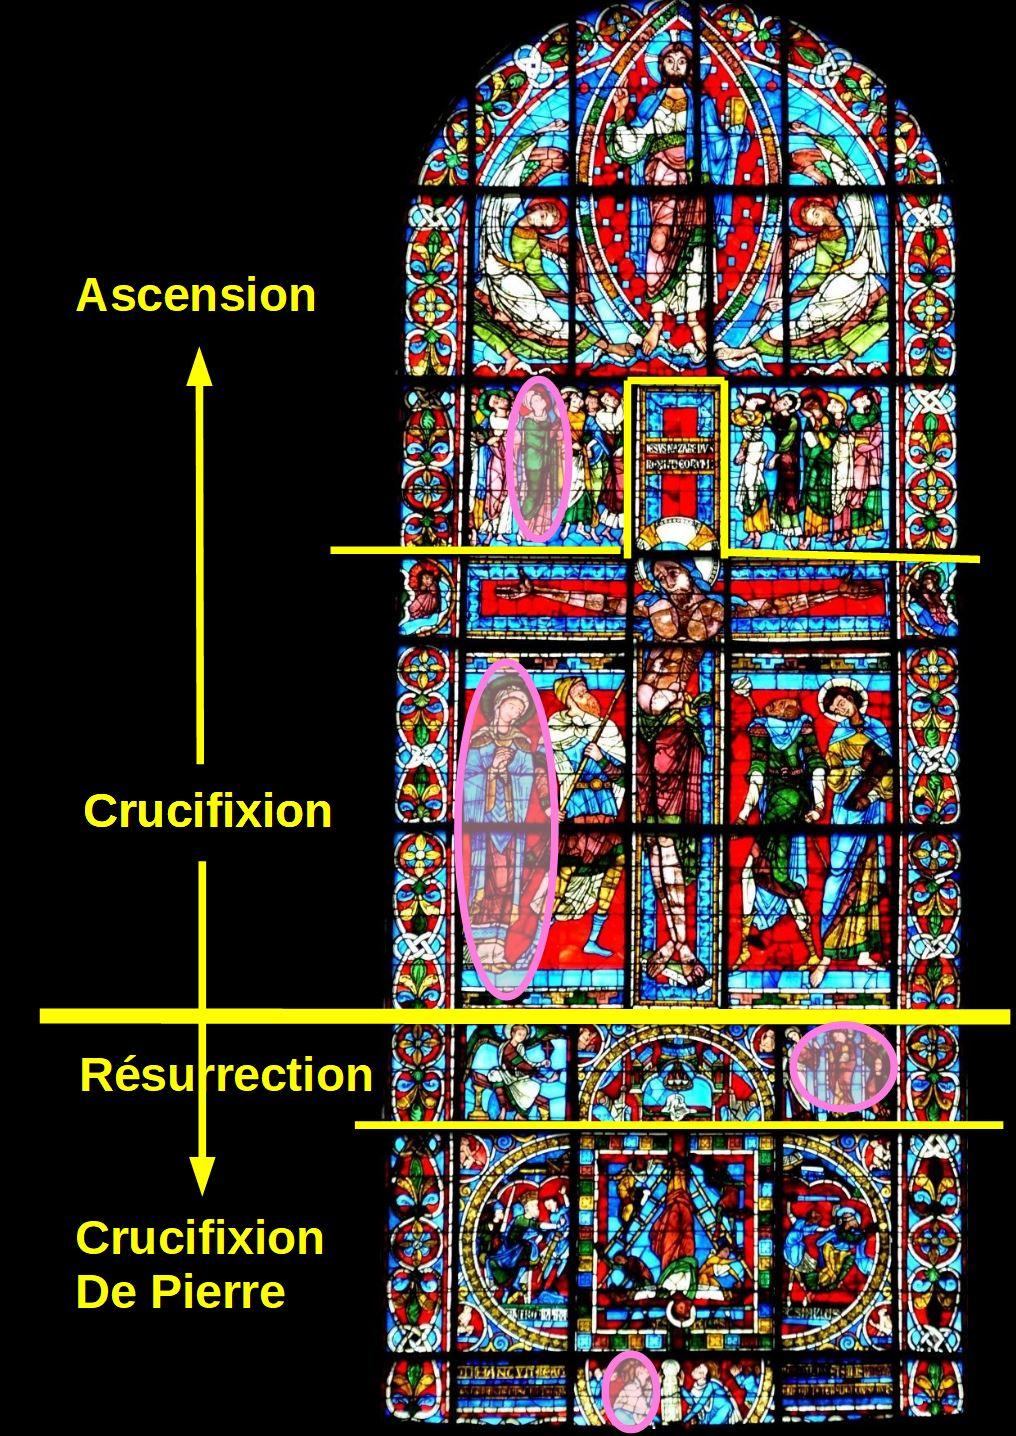 vitrail de la Crucifixion Cathedrale de Poitiers Resurerrection schema